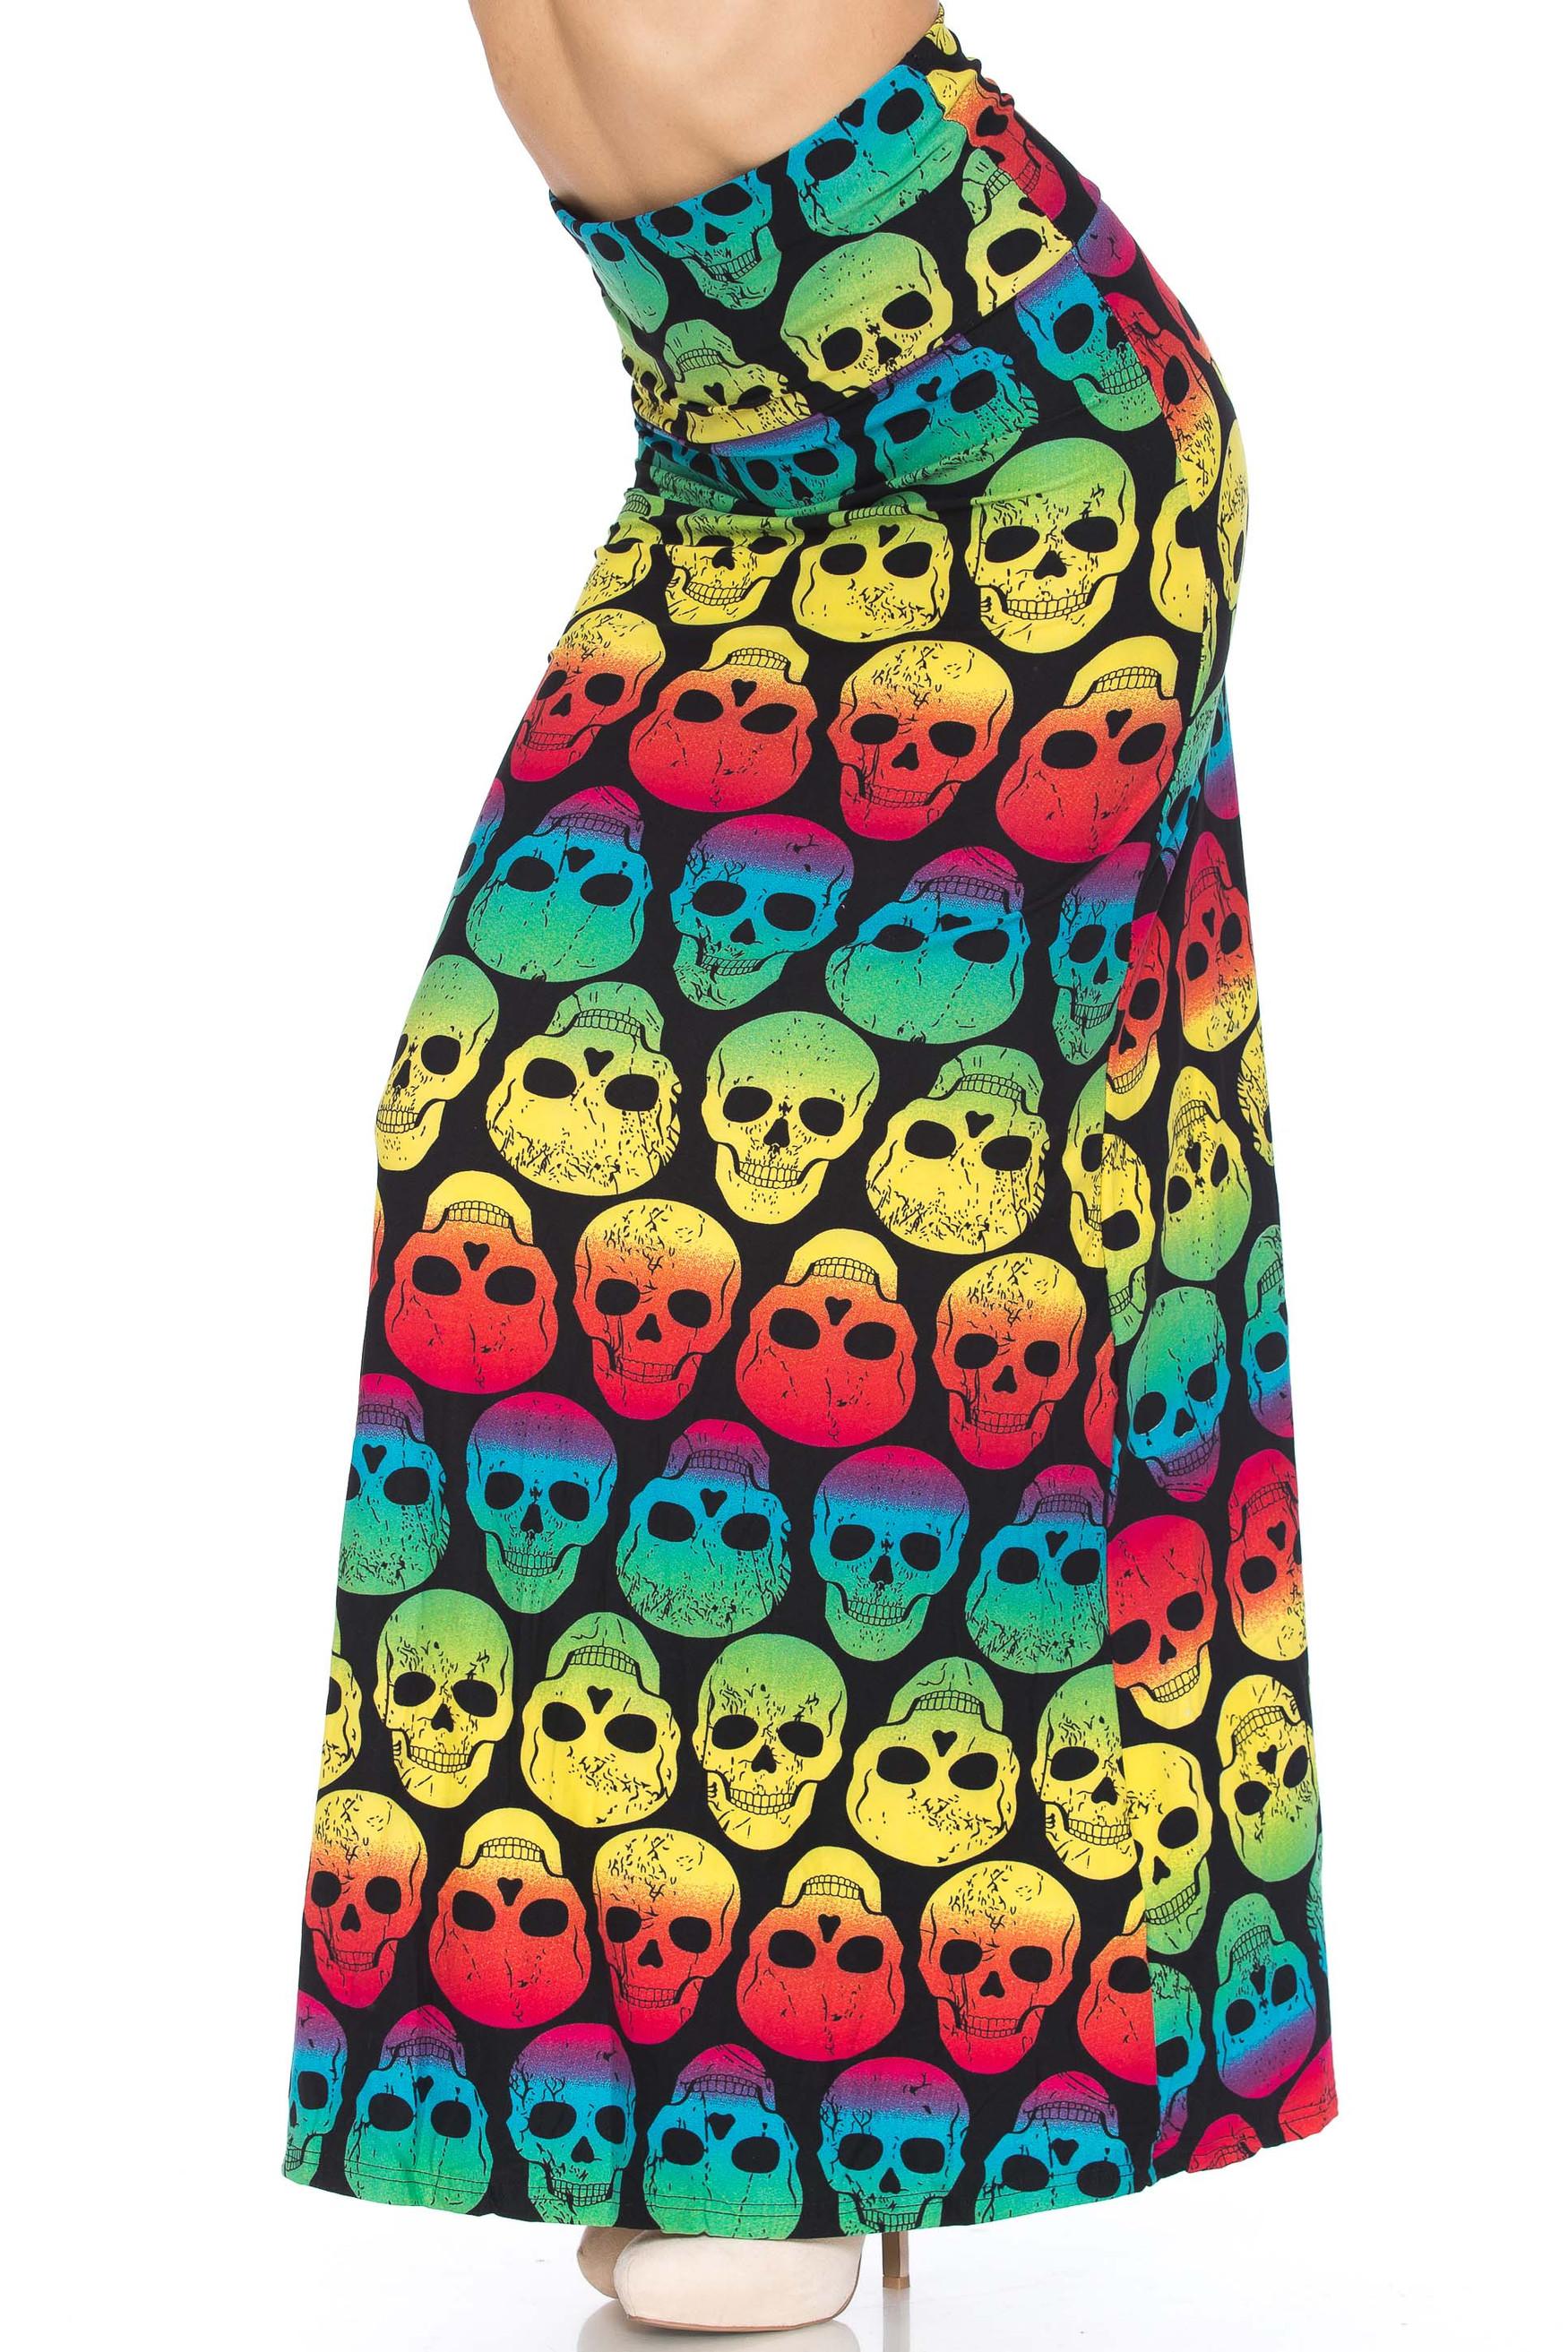 Rainbow Skull Plus Size Buttery Soft Maxi Skirt